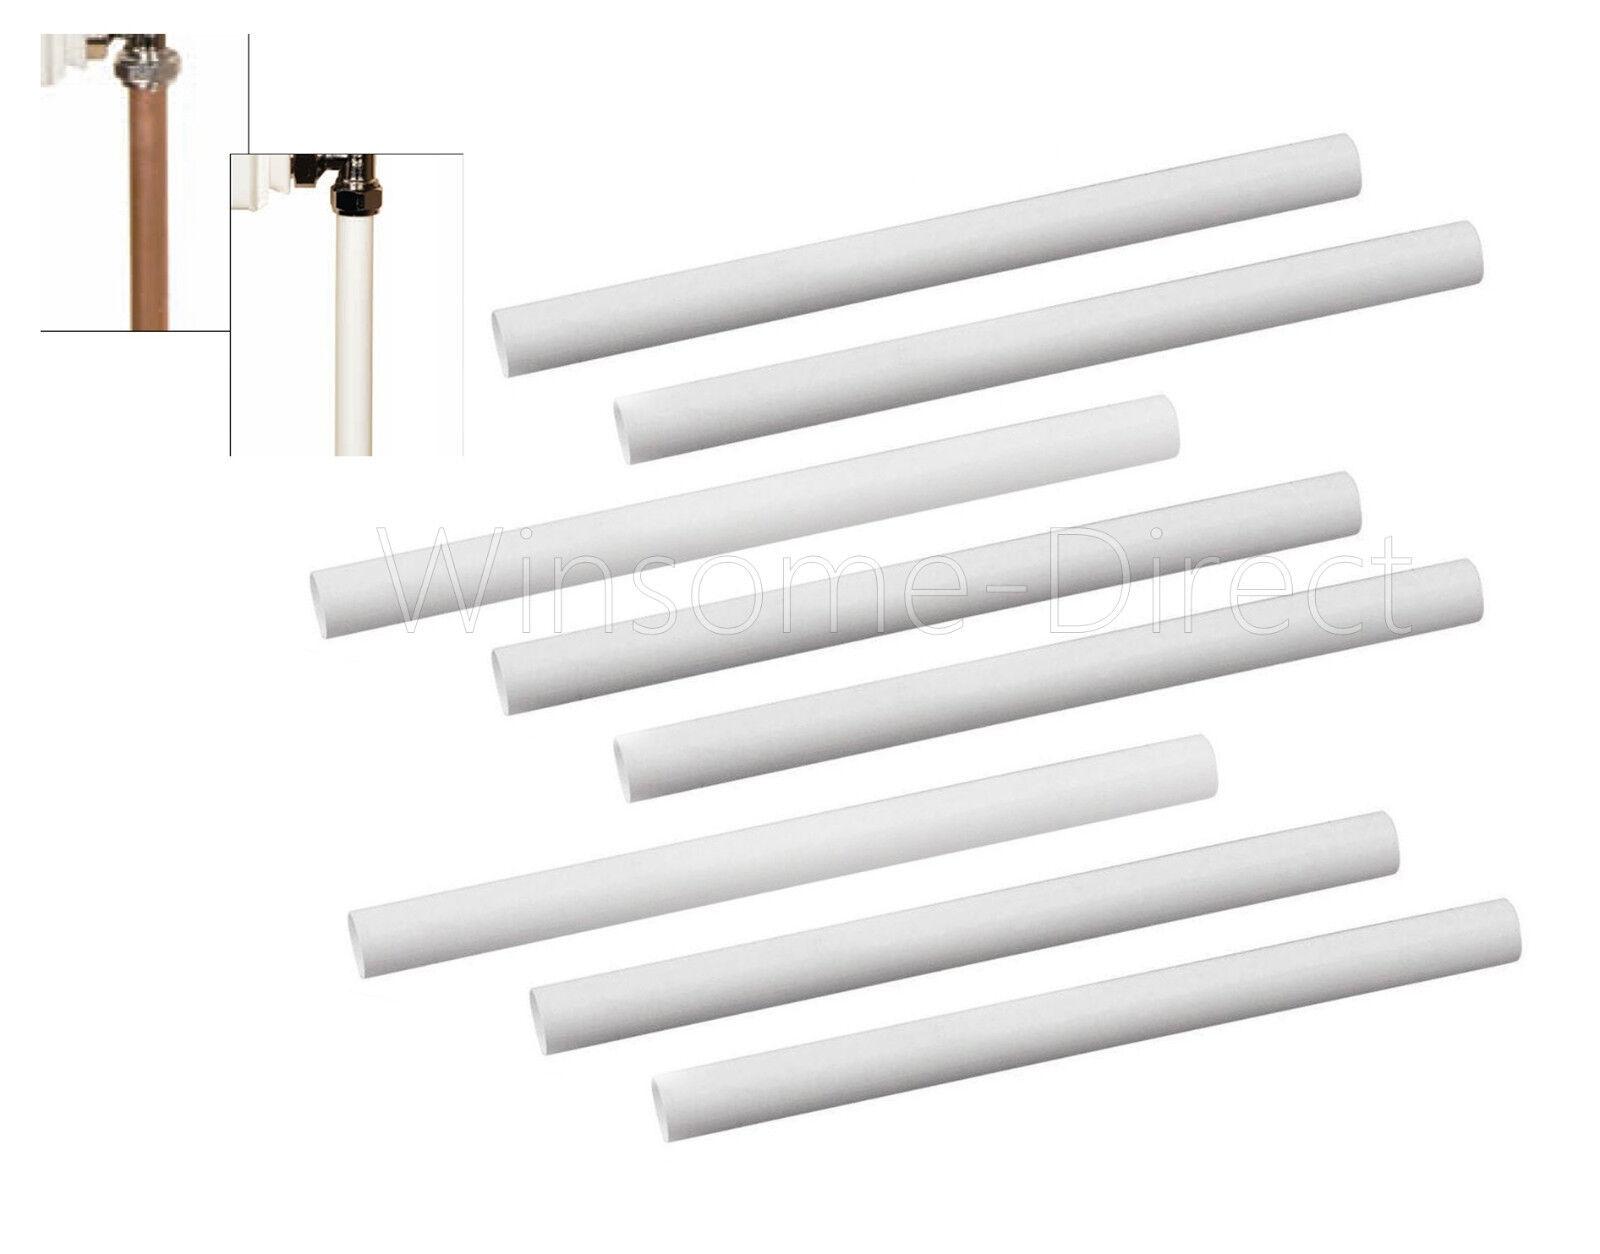 8 X 15 6 Cm White Plastic Radiator Sleeves Pipe Cover Ring